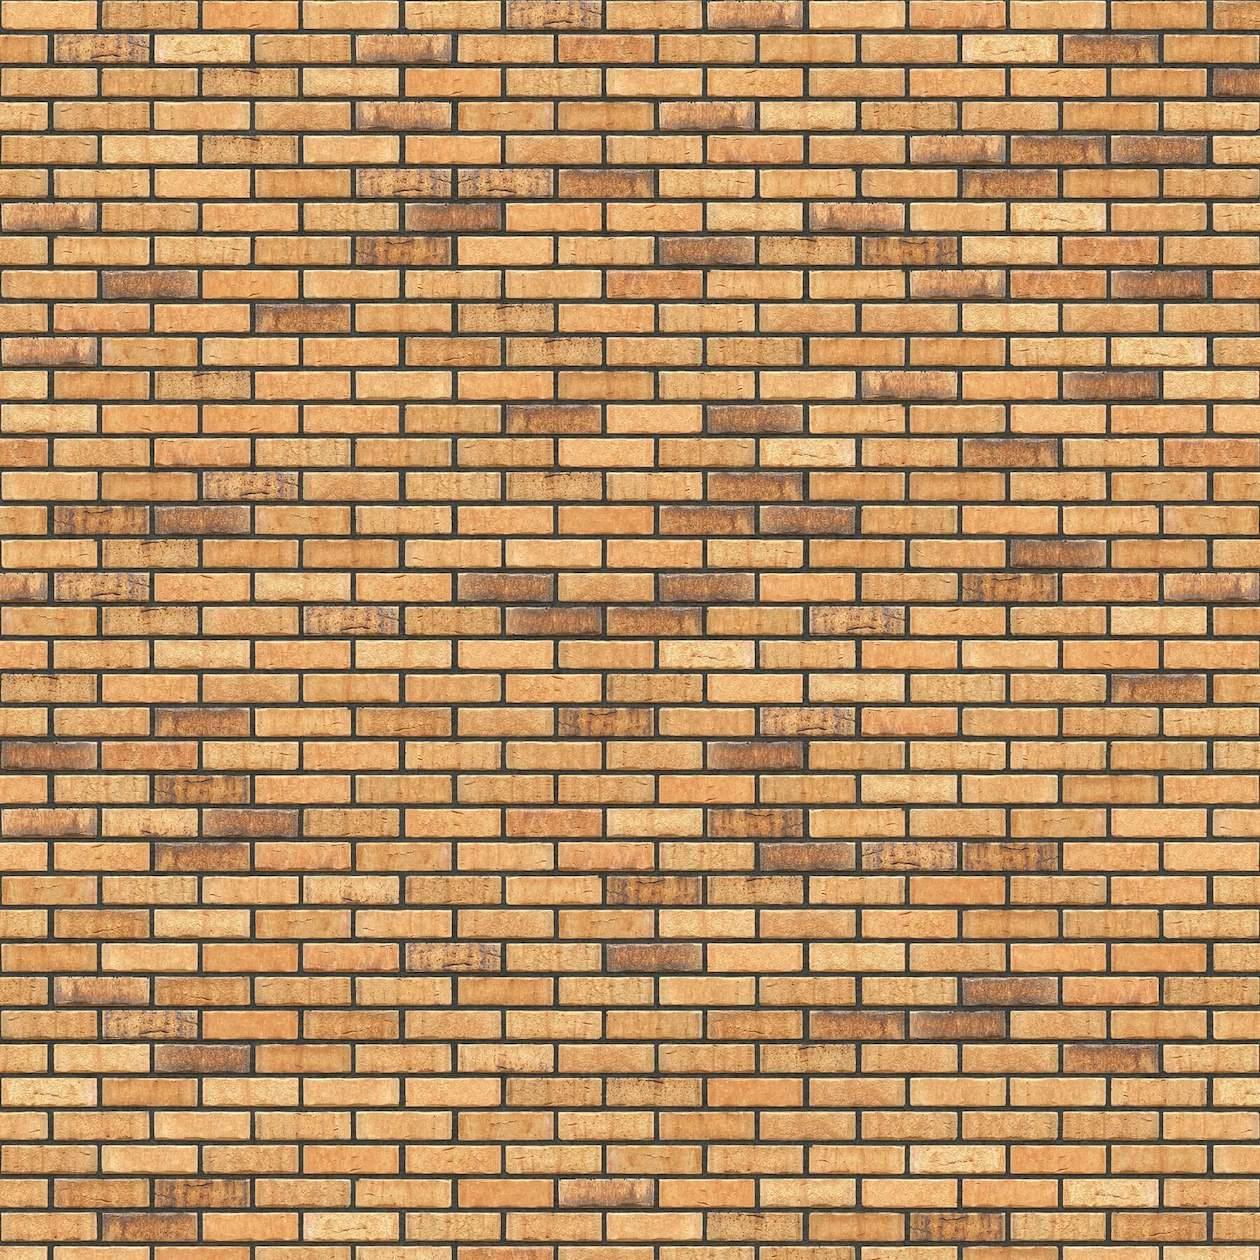 Puna-cigla-FeldHaus-Klinker-brick-house-nf-k-665-Antracit Fuga